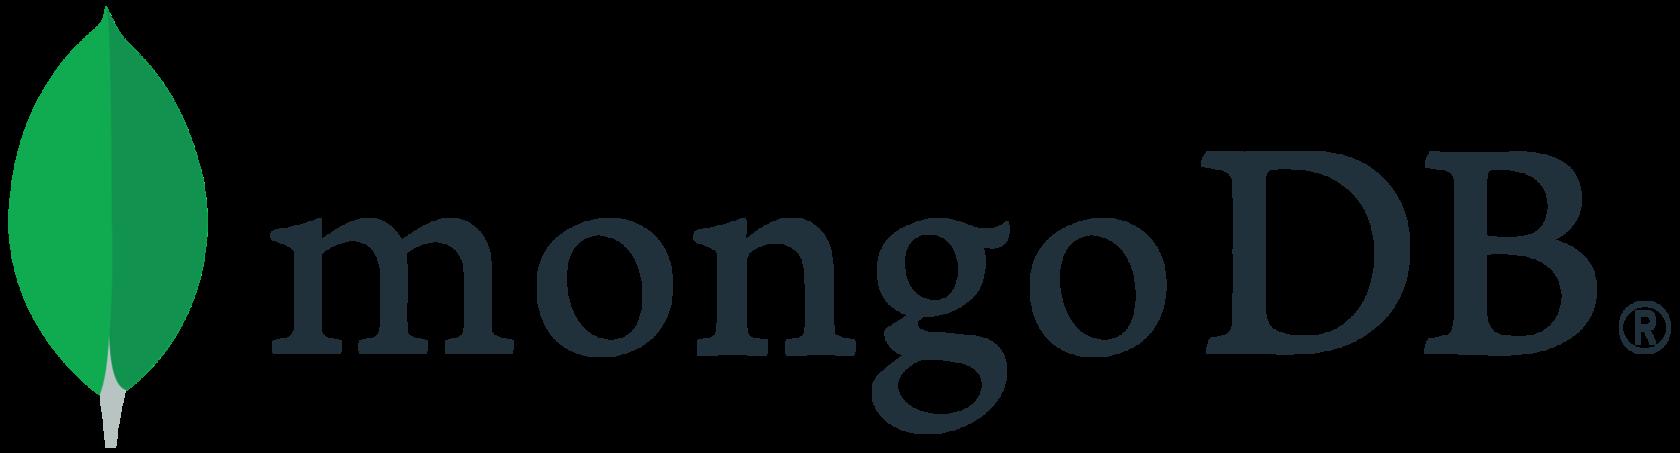 Automation testing MongoDB